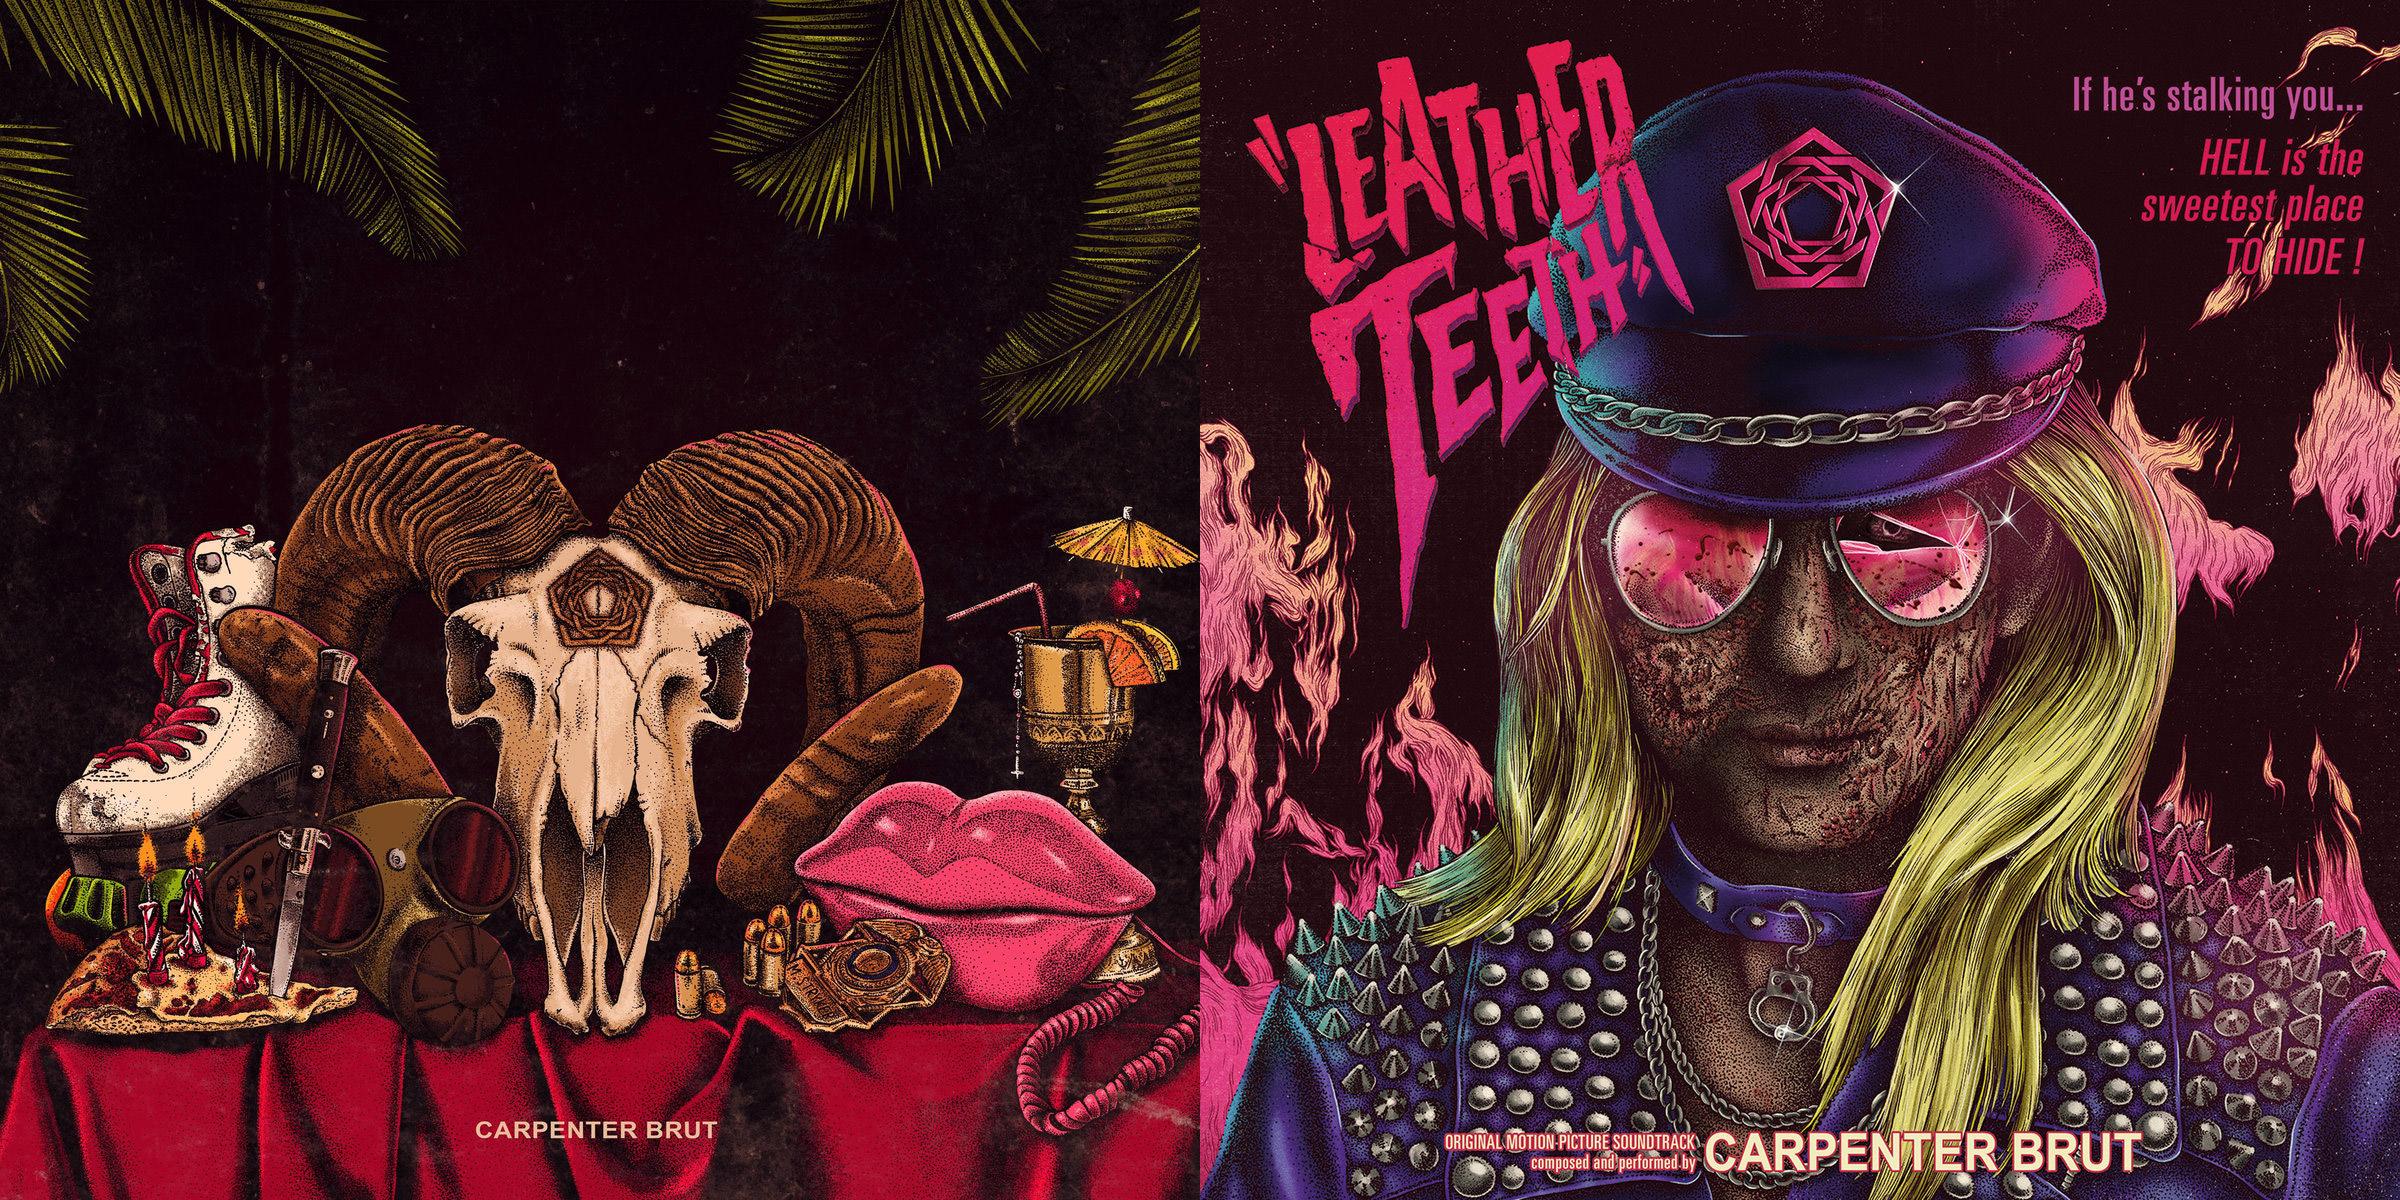 Carpenter Brut: Leather Teeth / Trilogy